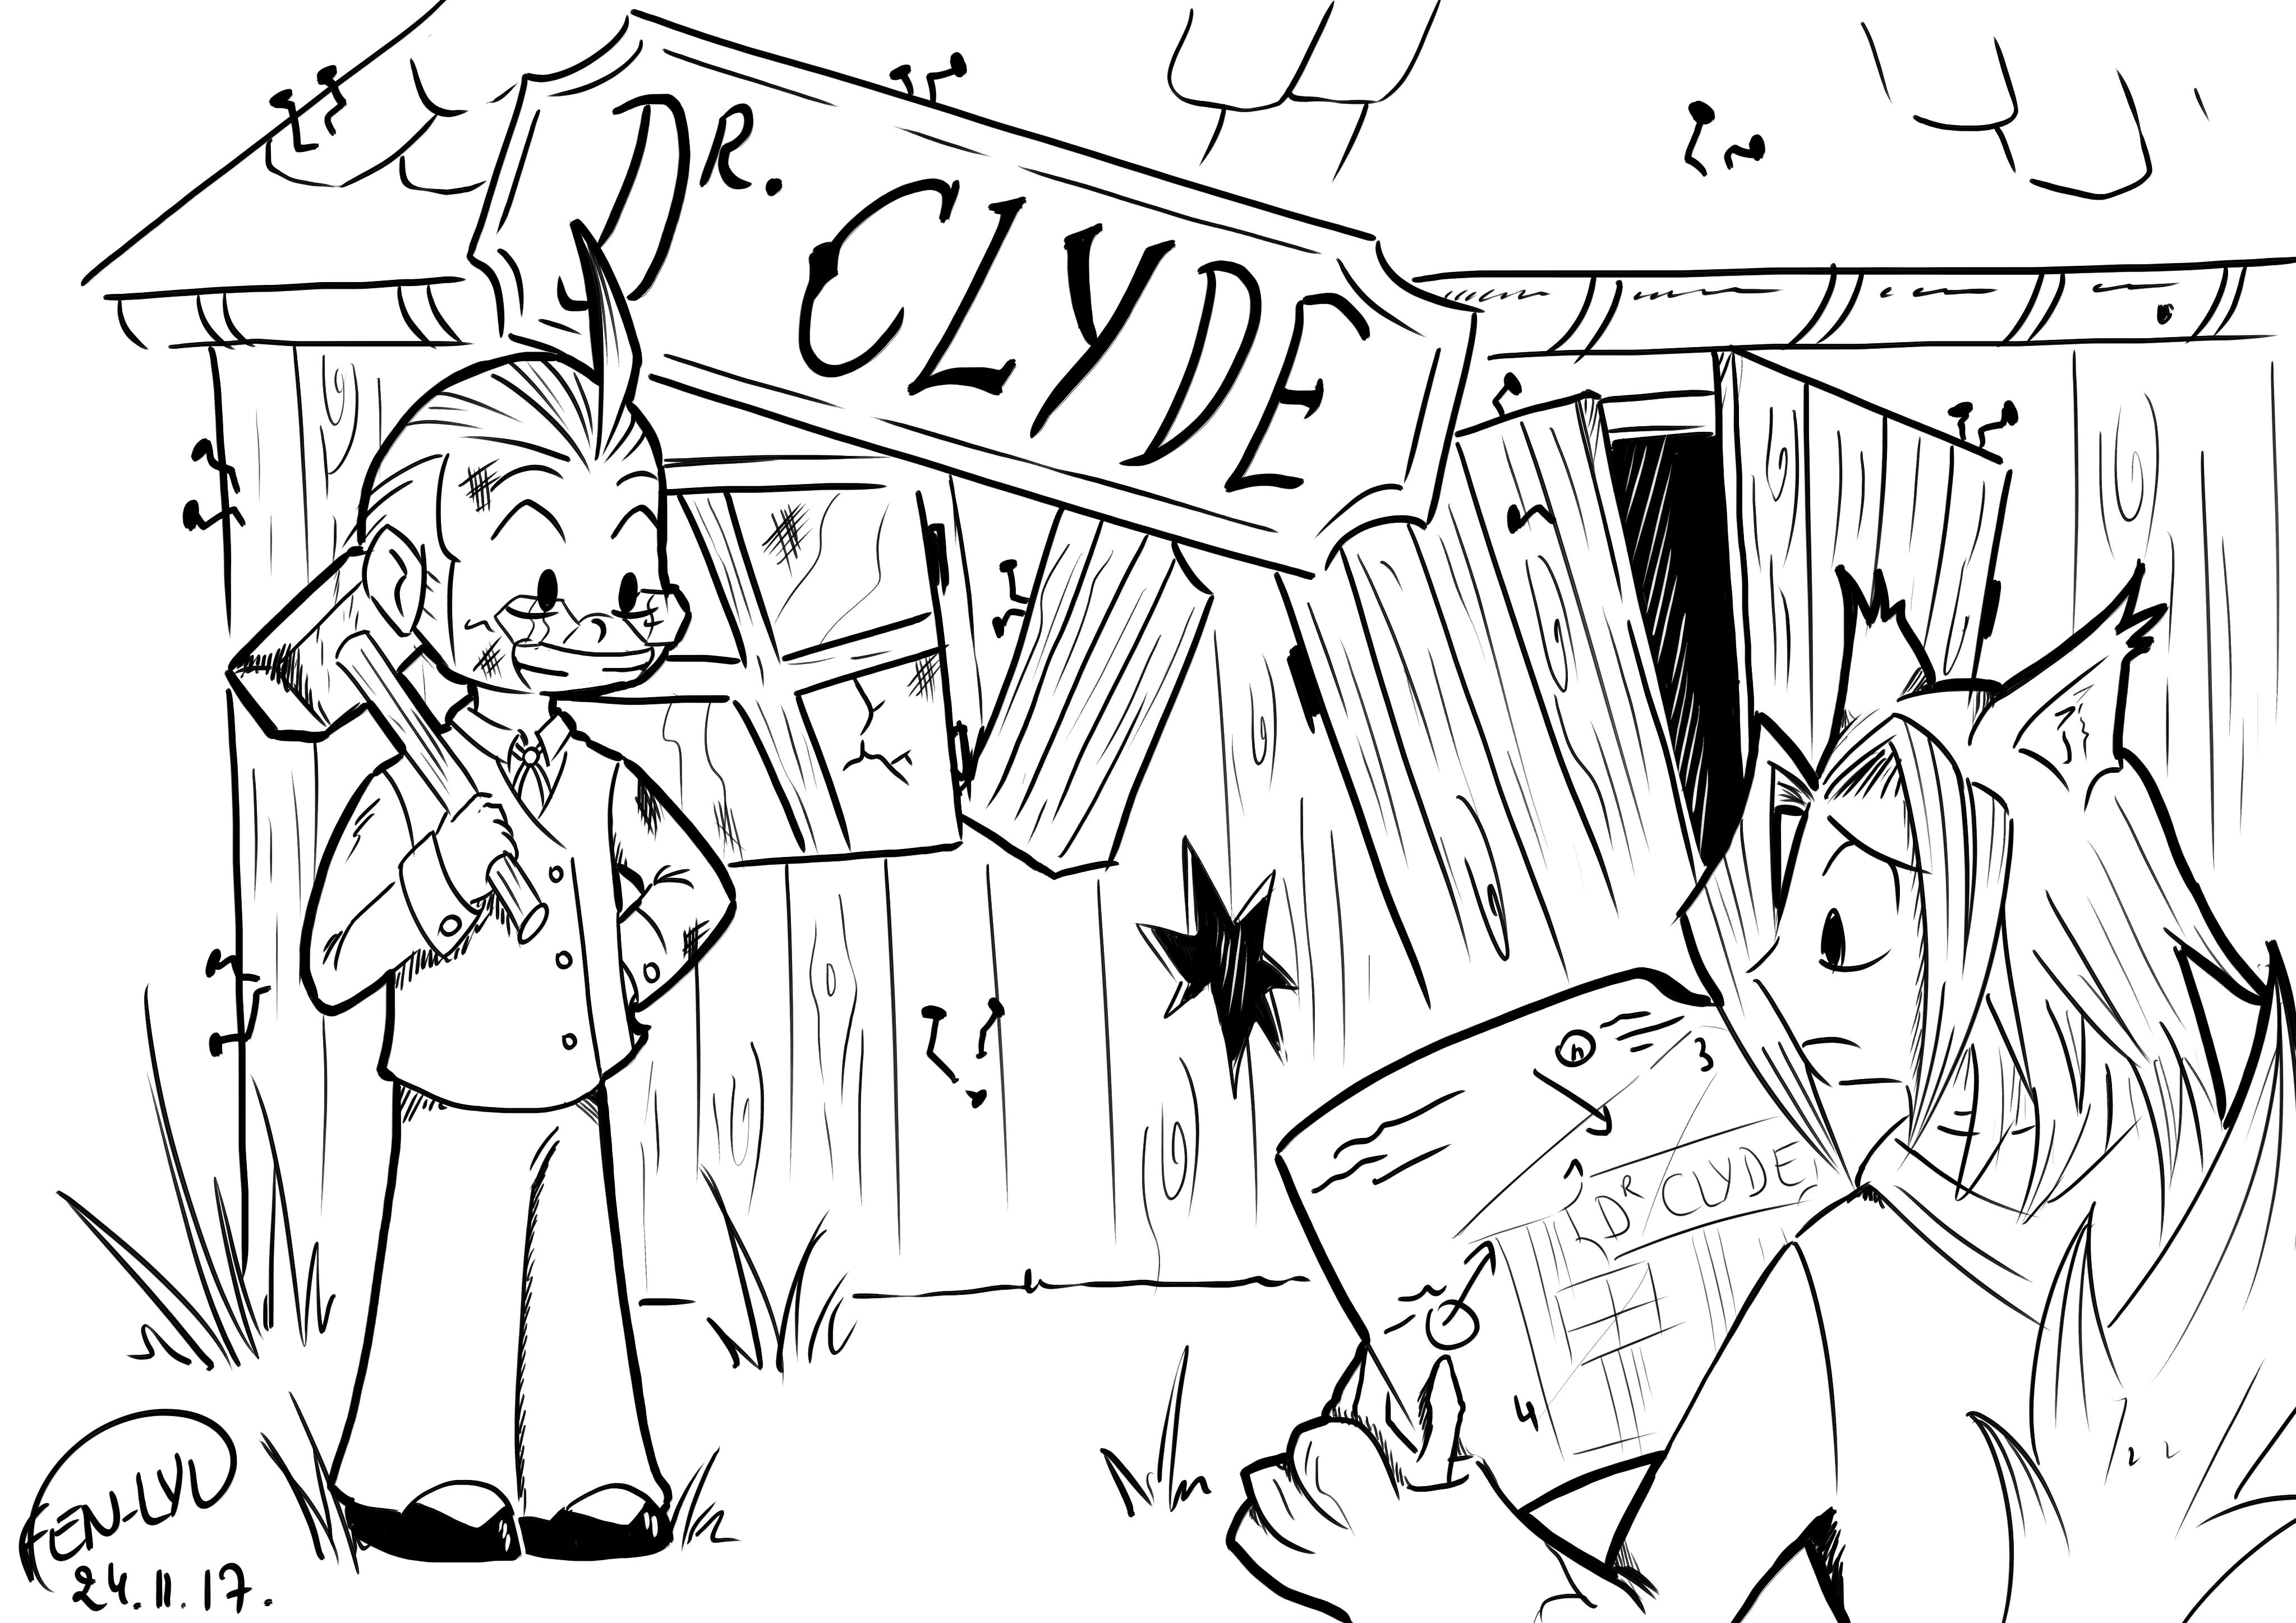 Distillerie Dr. Clyde